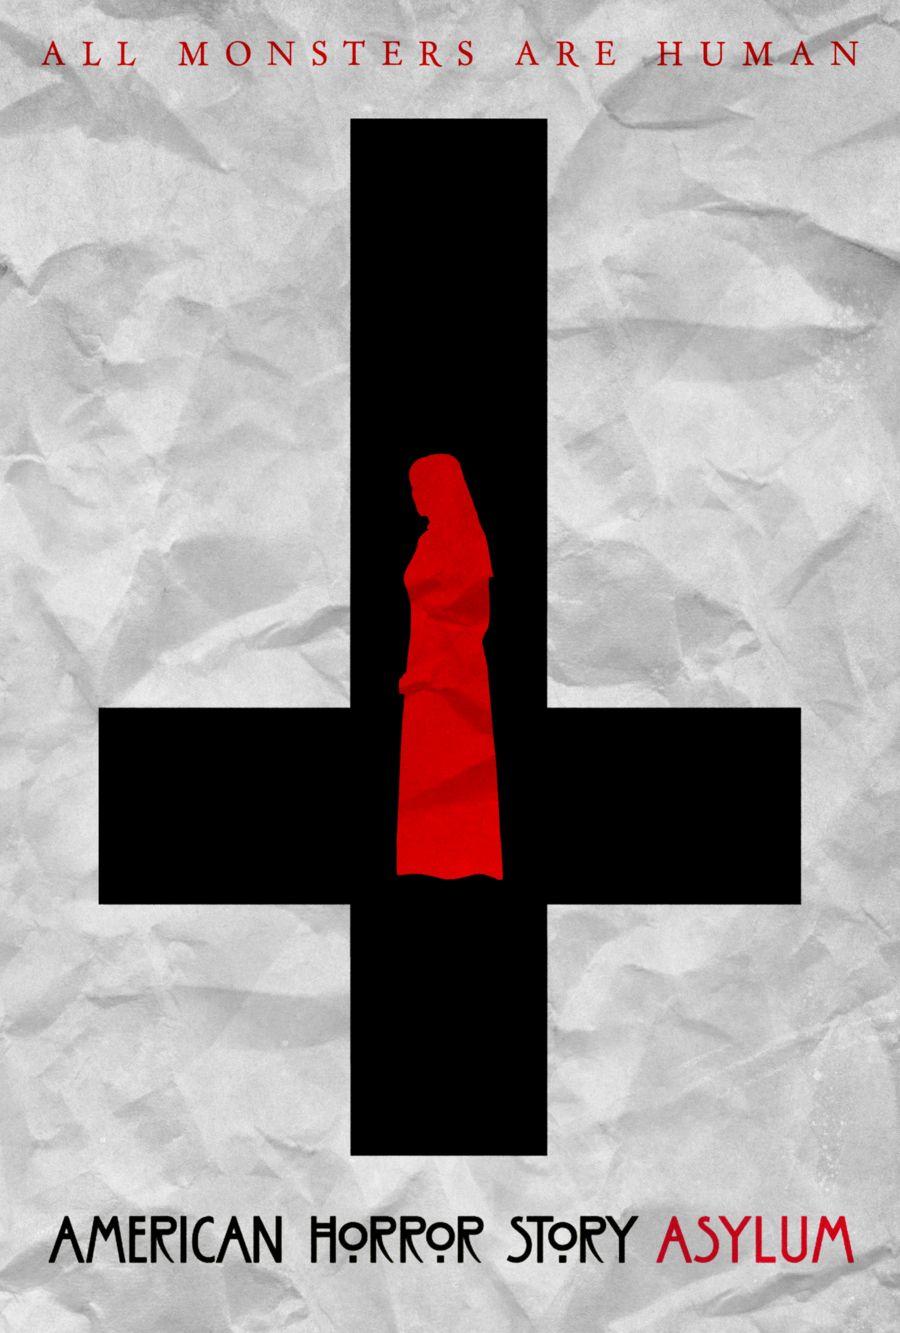 Image from http://fc07.deviantart.net/fs71/i/2014/064/2/0/lucifer_is_inside___ahs__asylum_poster_by_disgorgeapocalypse-d791lh2.png.